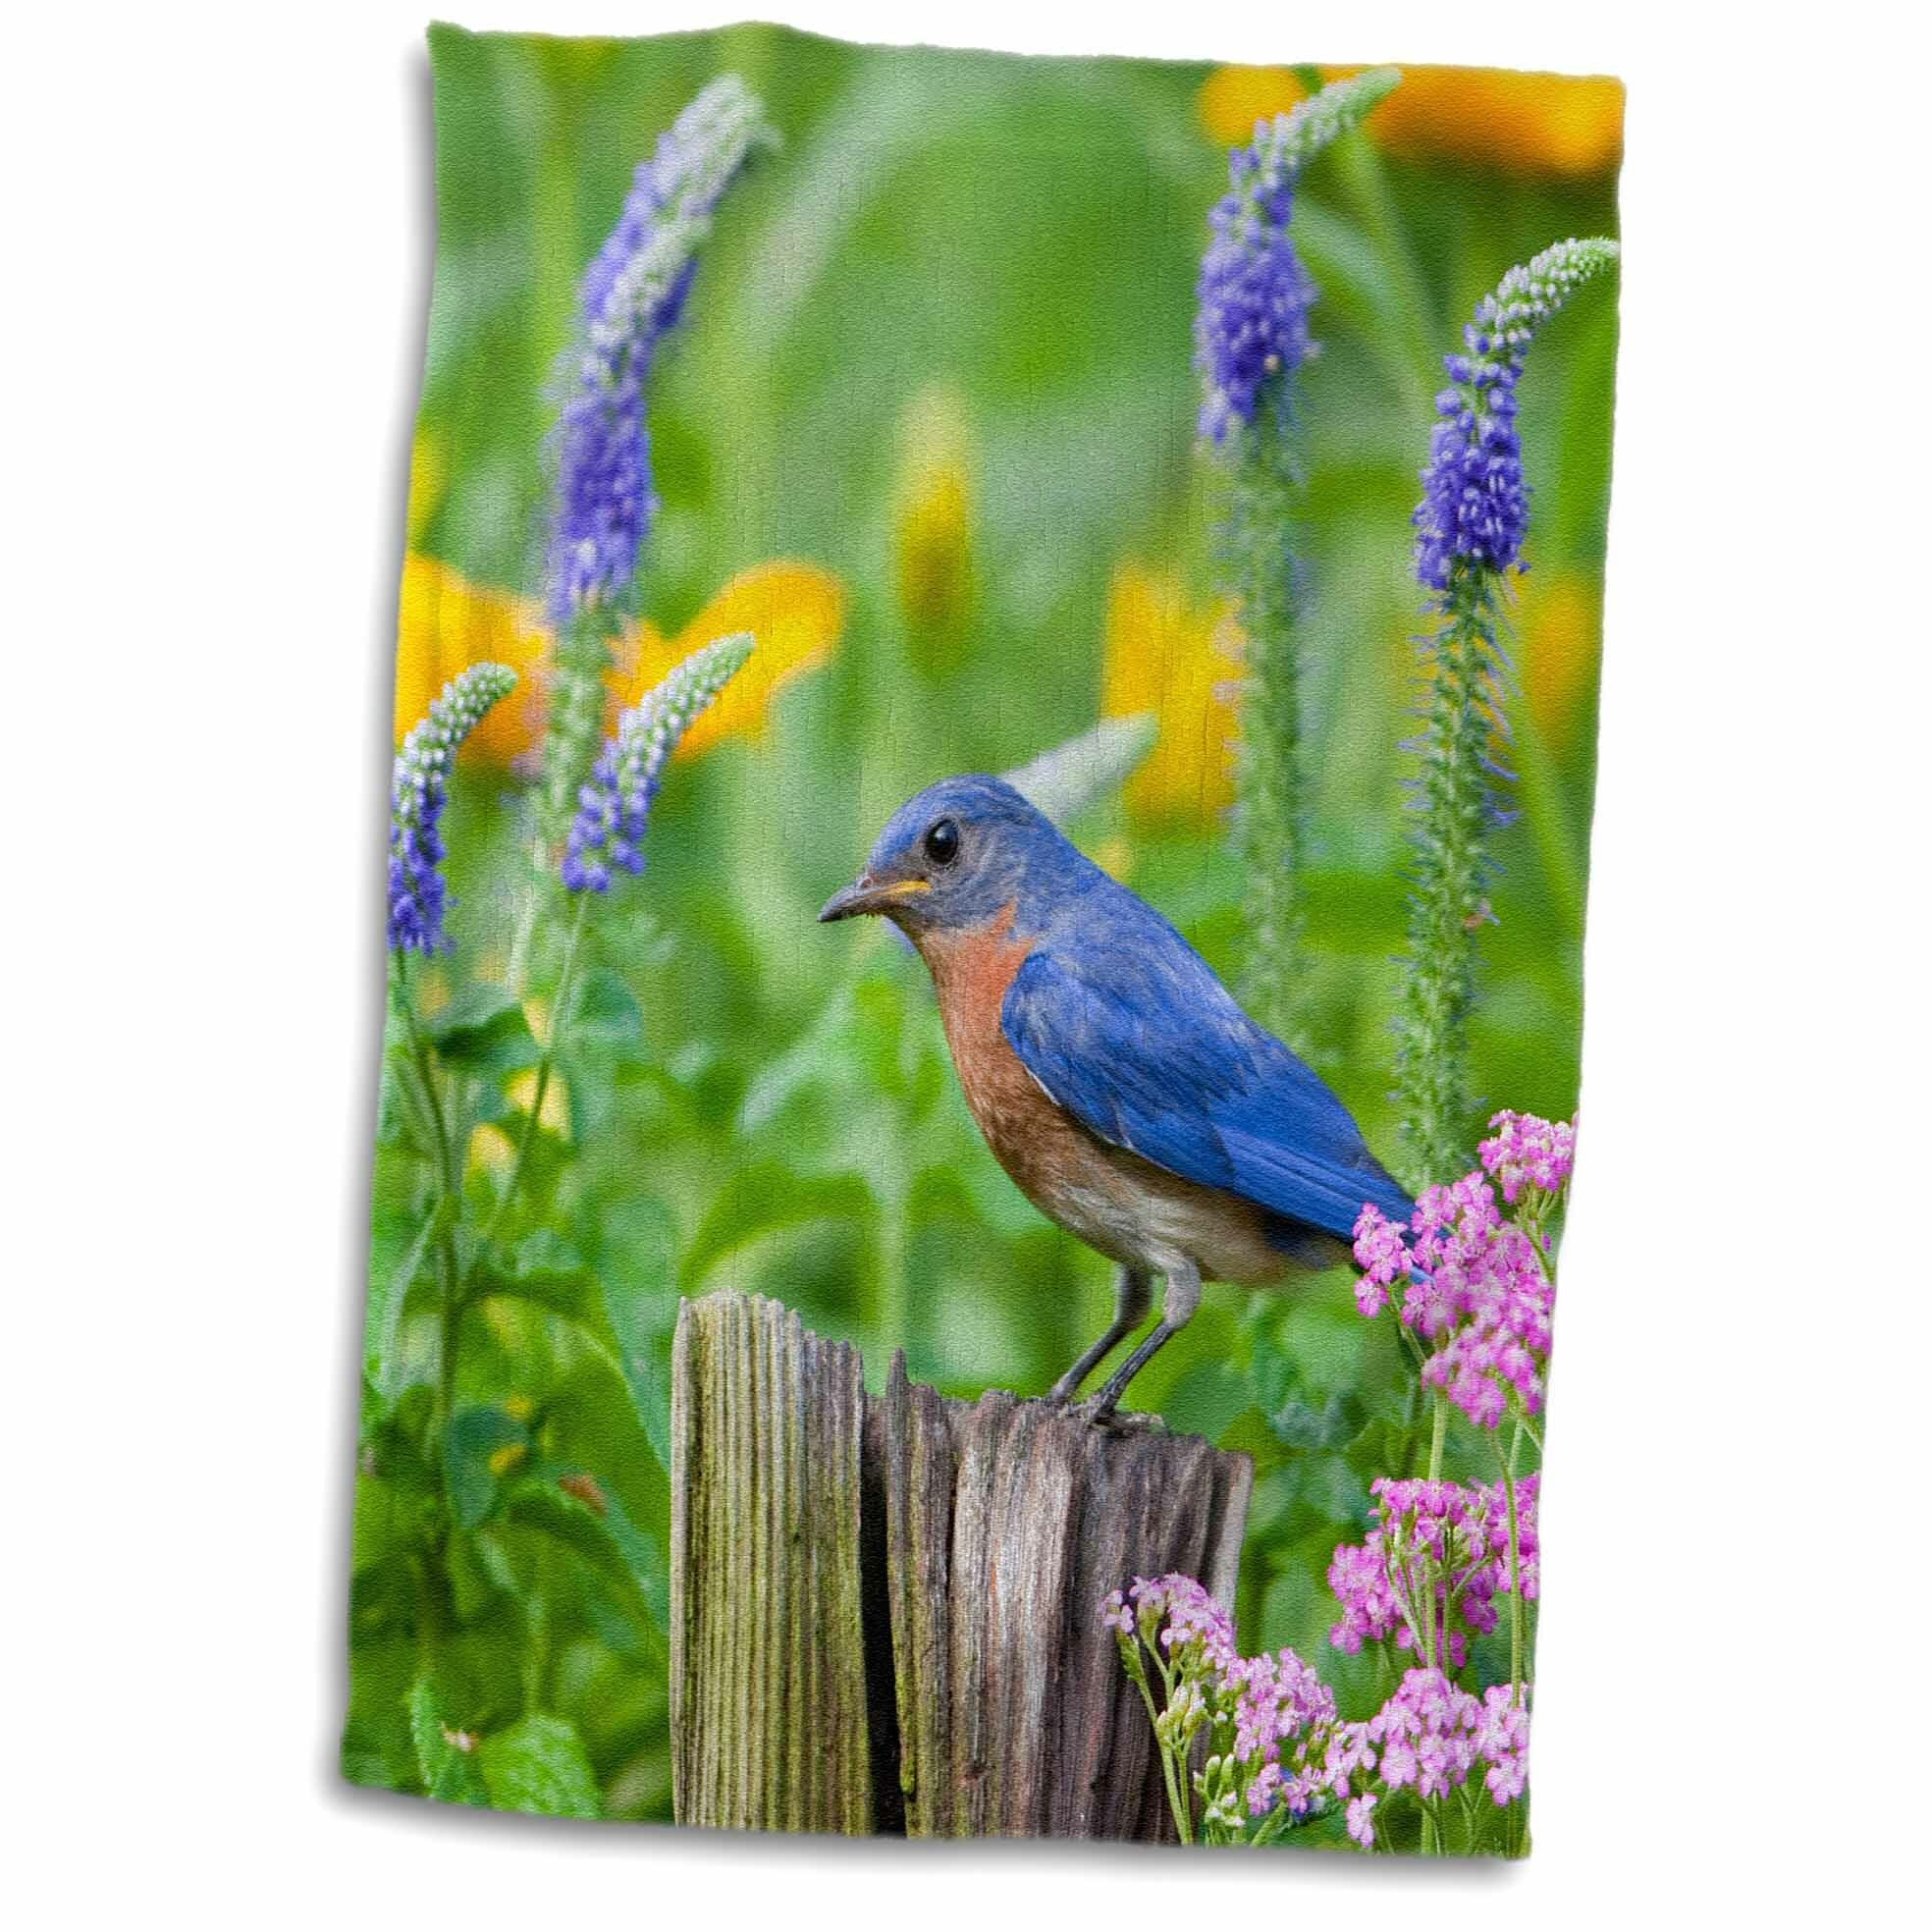 East Urban Home Godfrey Eastern Bluebird On Fence Post In Flower Garden Marion Co Il Tea Towel Wayfair